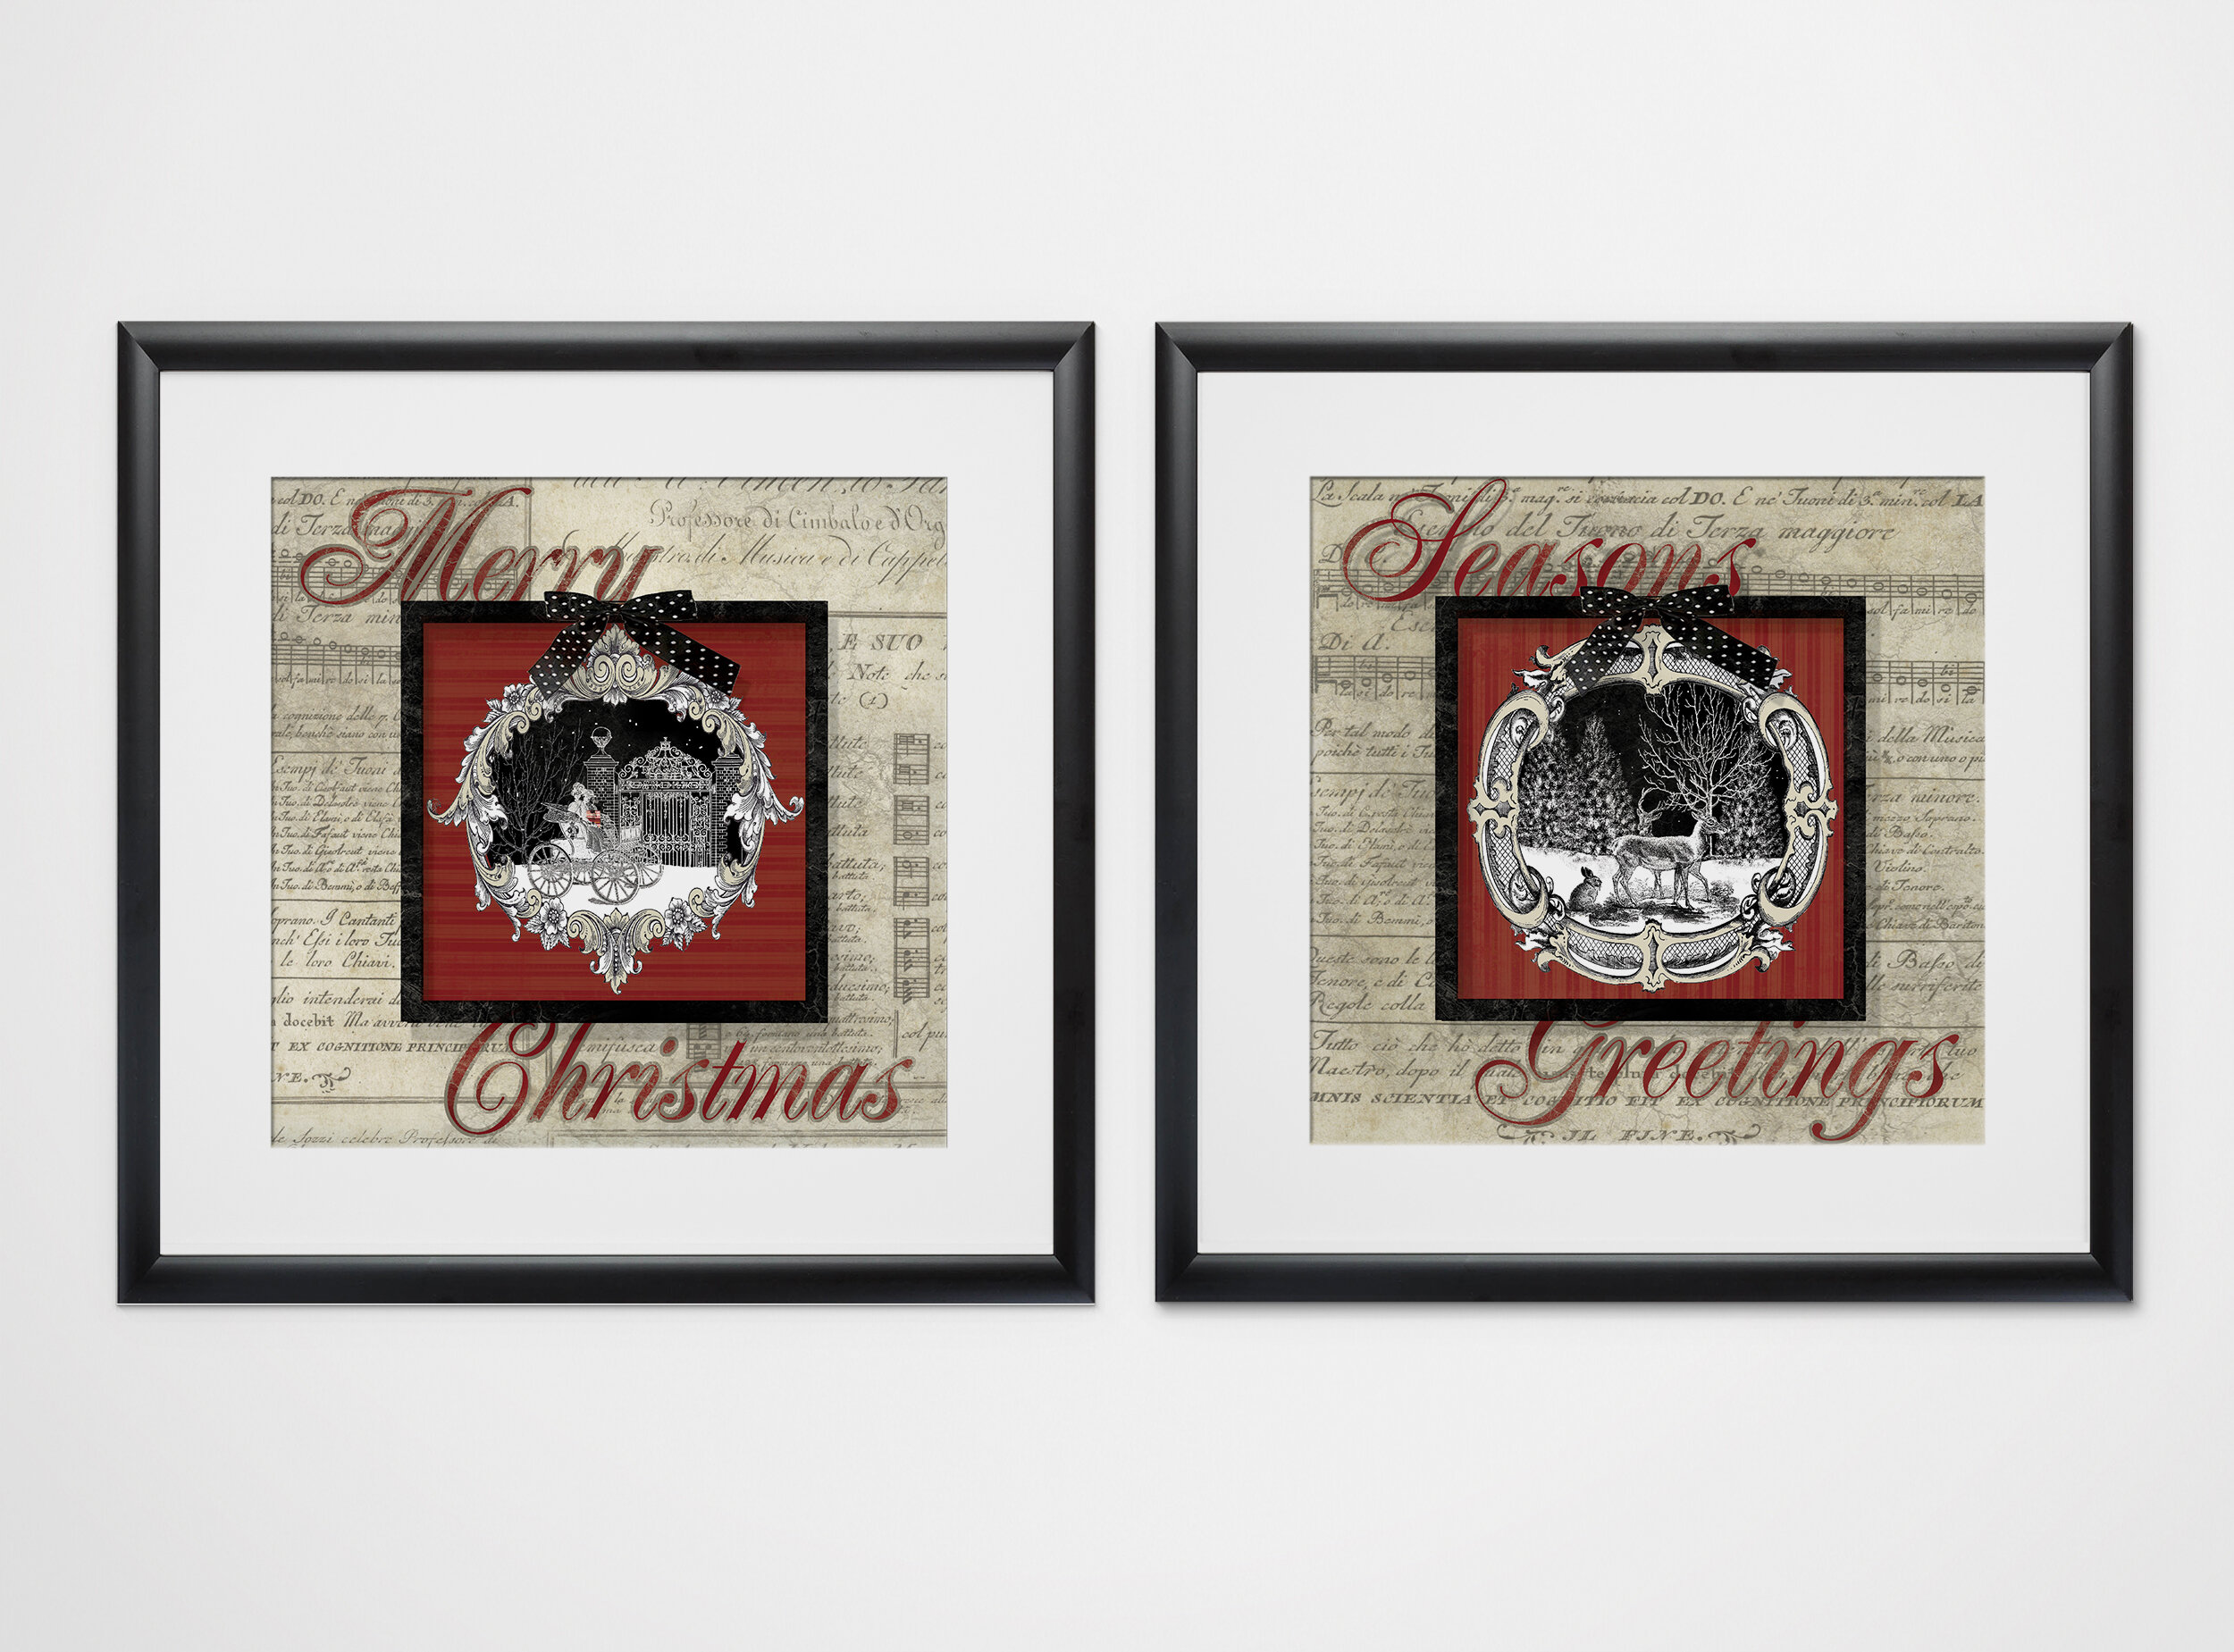 The Holiday Aisle Vintage Christmas 2 Piece Framed Graphic Art Print Set Wayfair